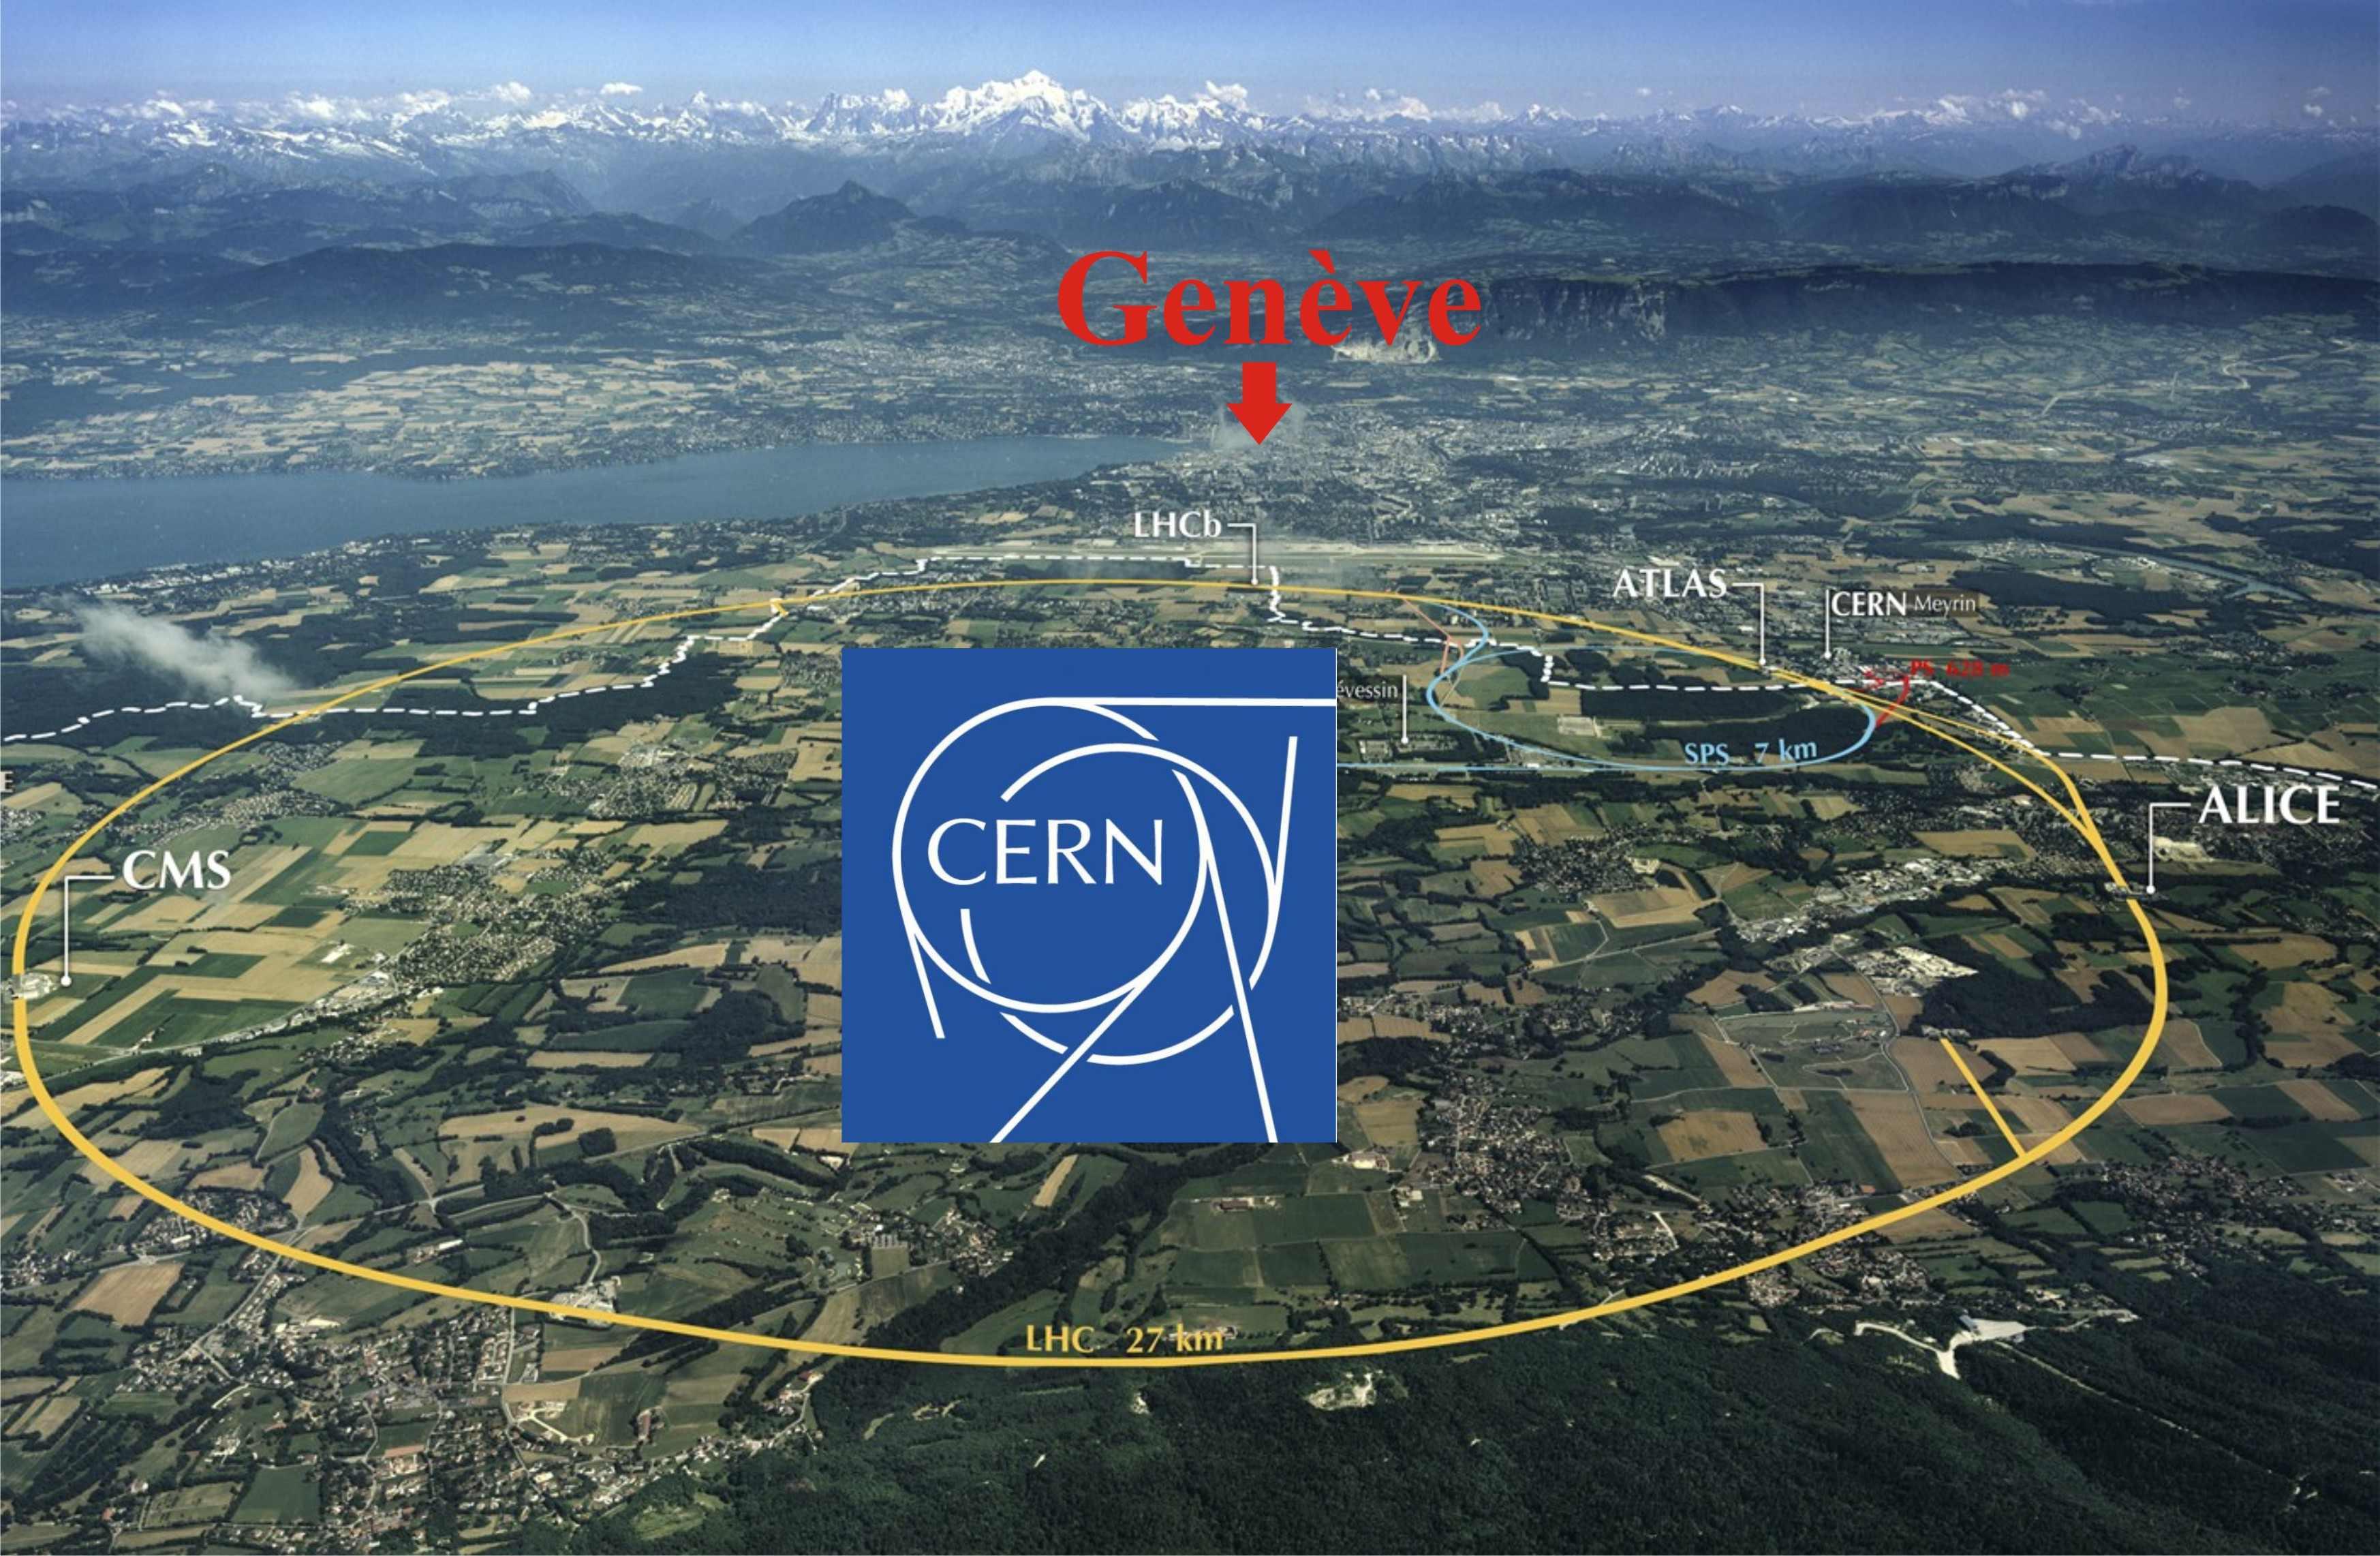 figures/CERN-BE-CO-HT/CERN_intro_0.jpg